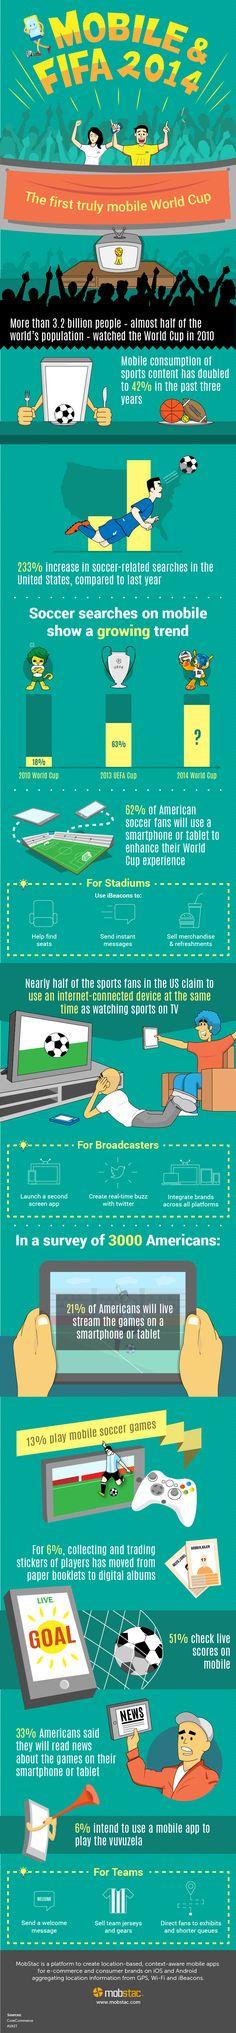 #brasil2014 el Mundial Móvil #digisport #sportbiz #mobile #marketing